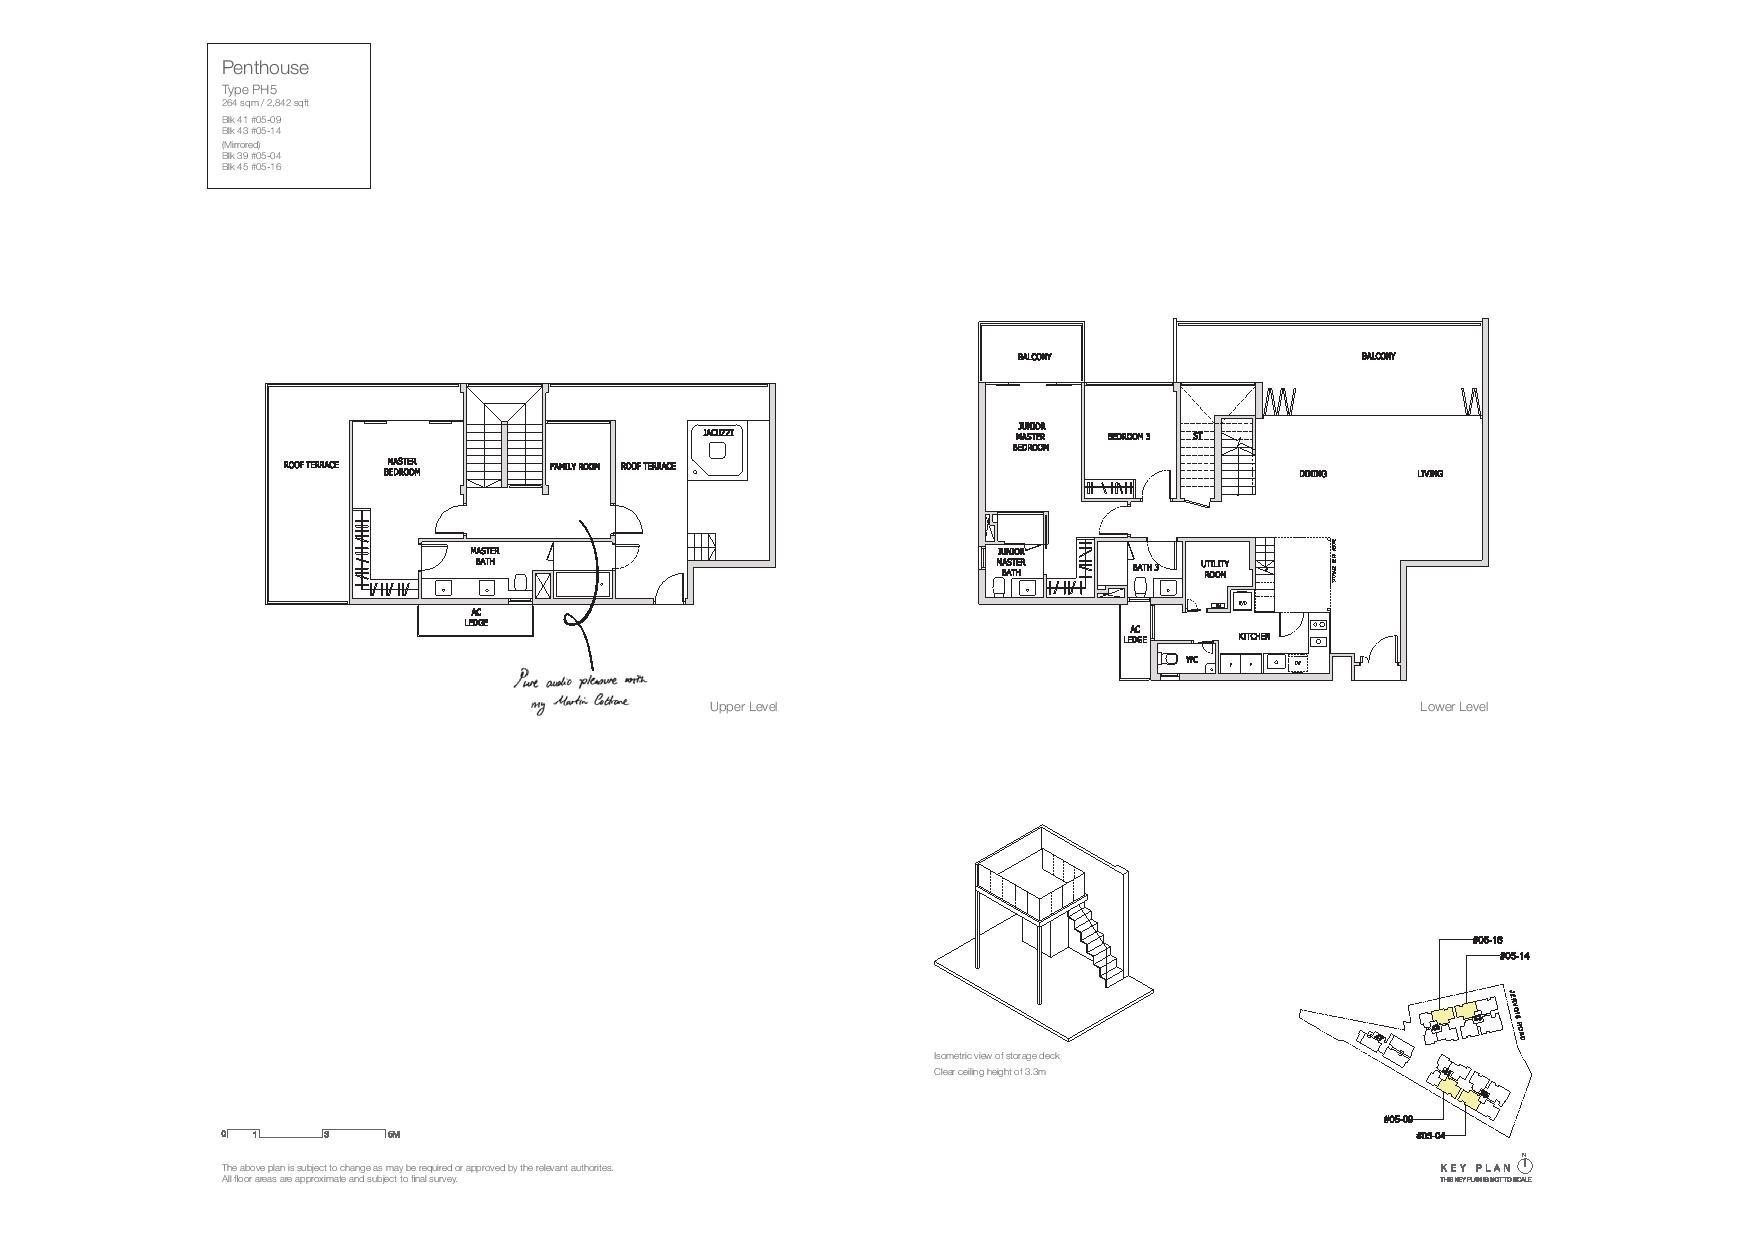 Mon Jervois Penthouse Floor Plans Type PH5